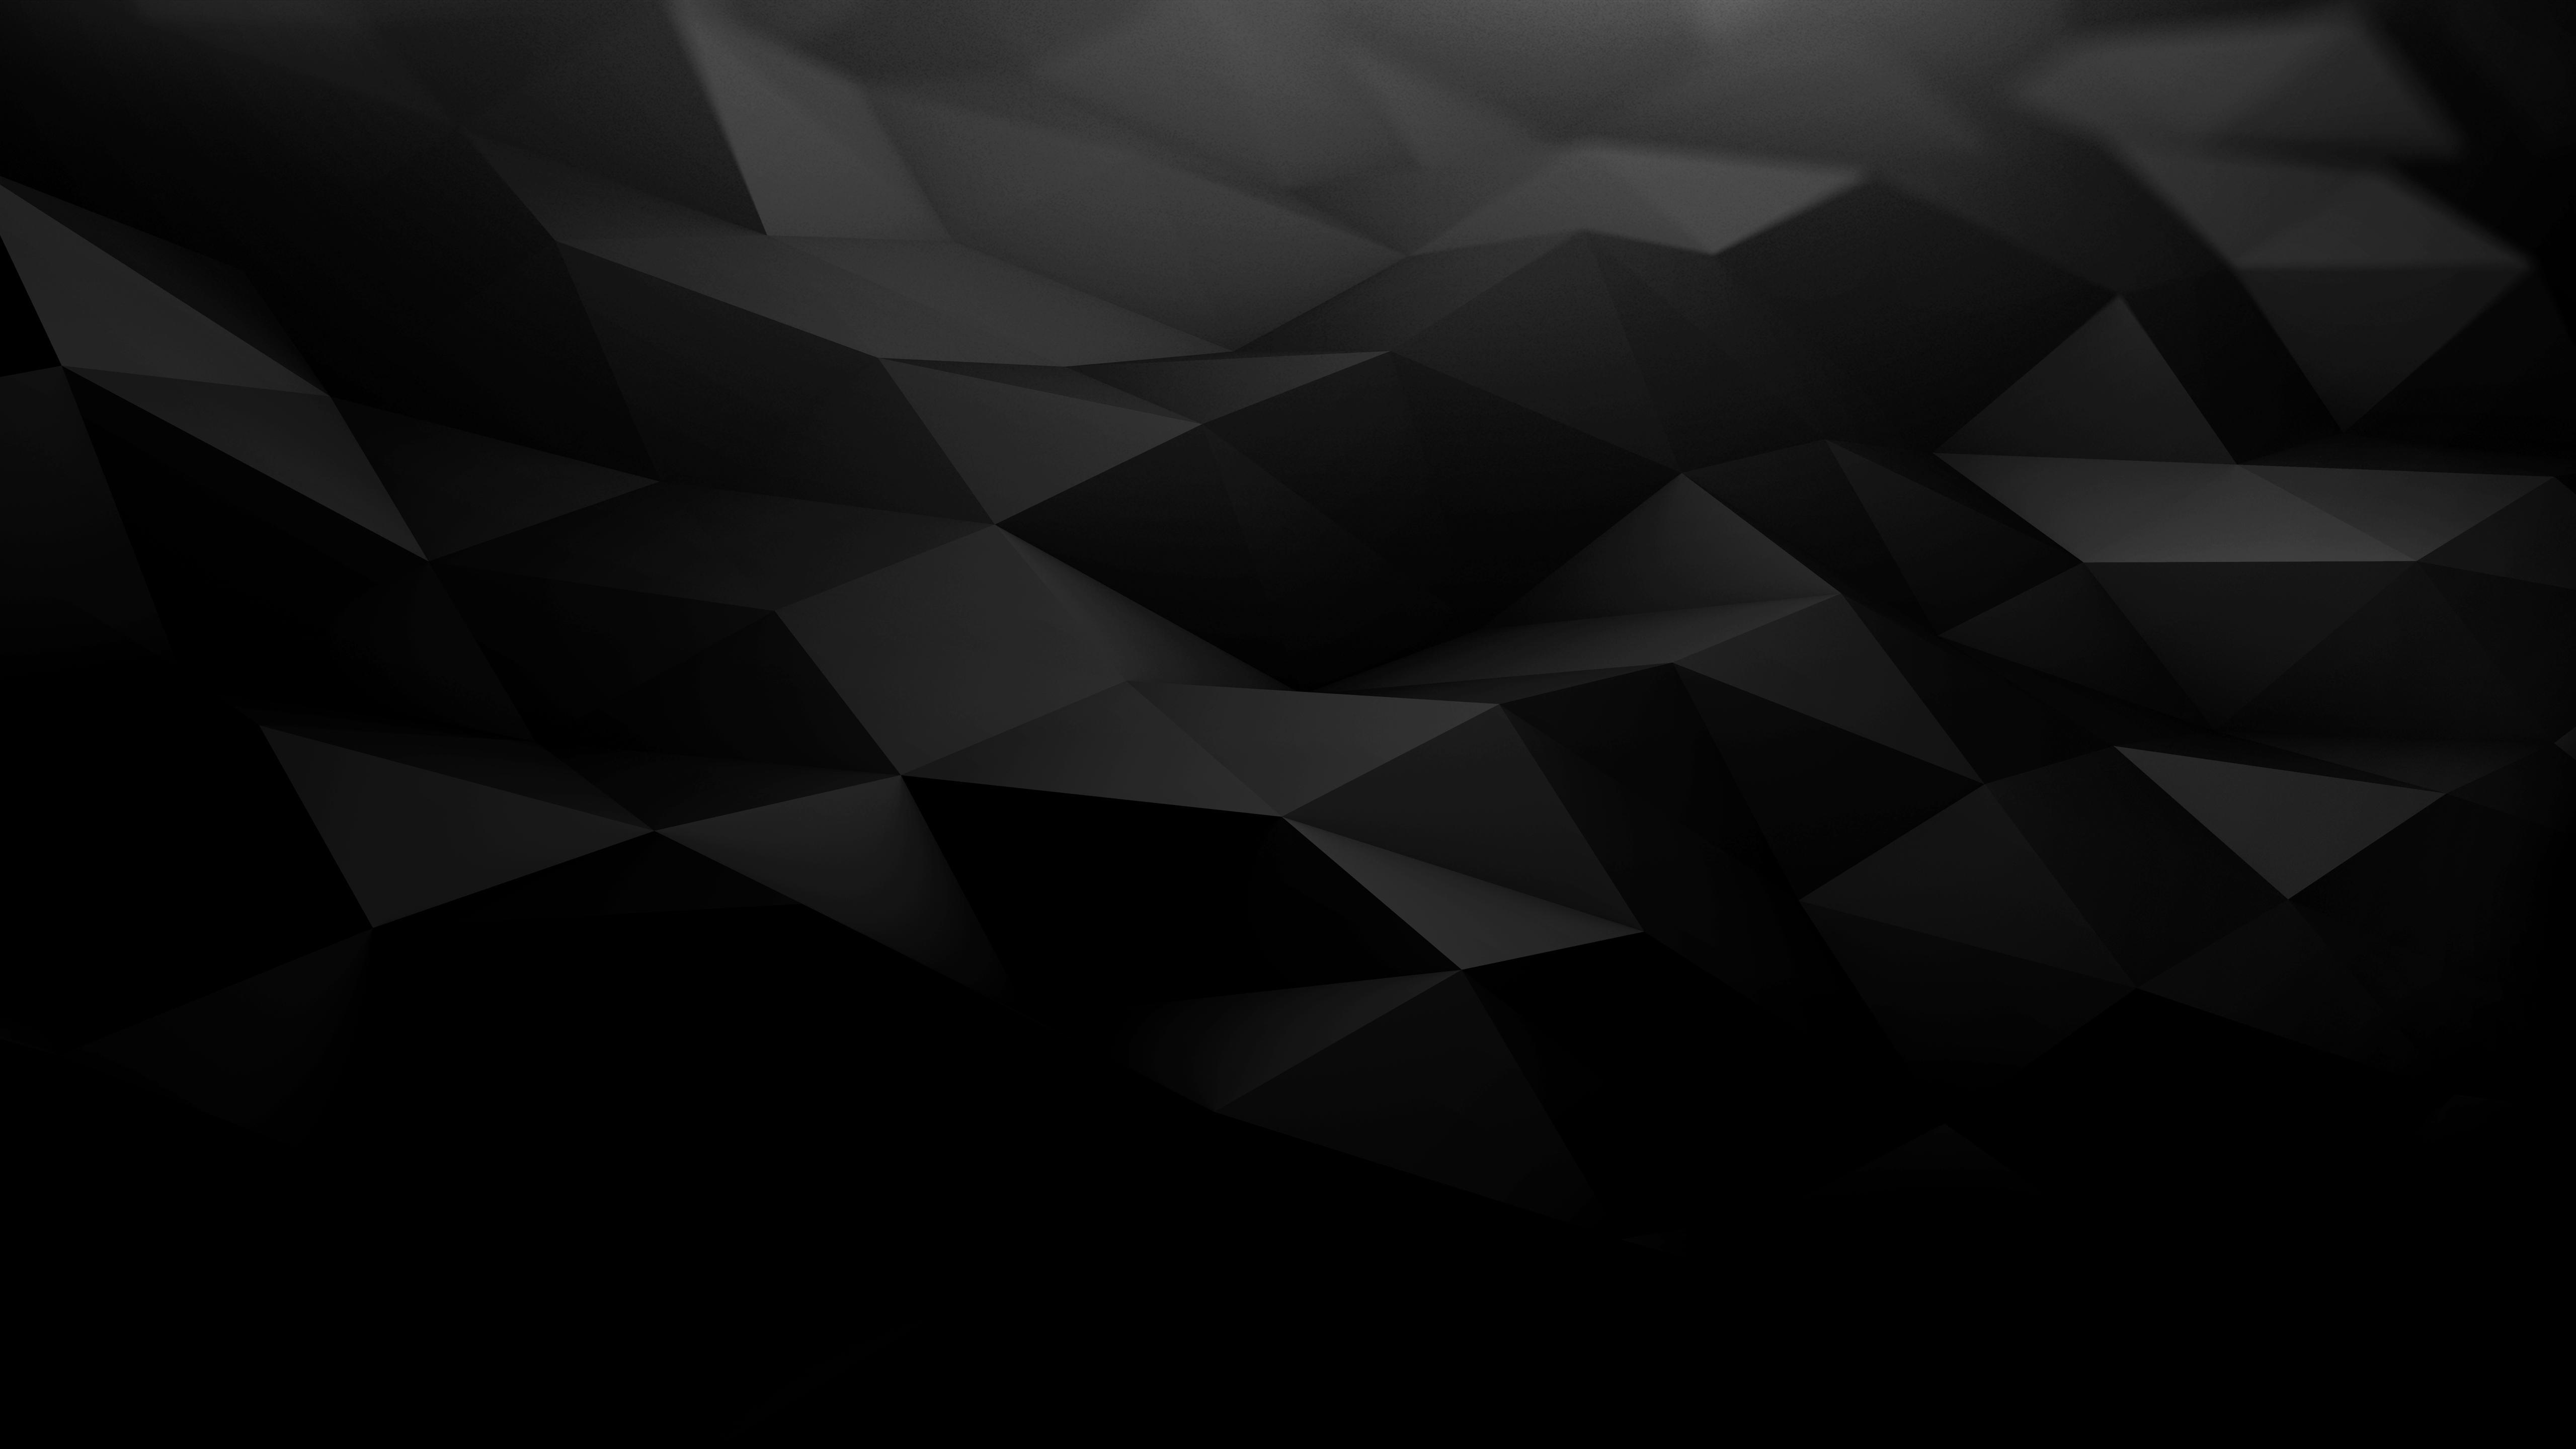 2048x1152 Noir 5k 2048x1152 Resolution Hd 4k Wallpapers Images